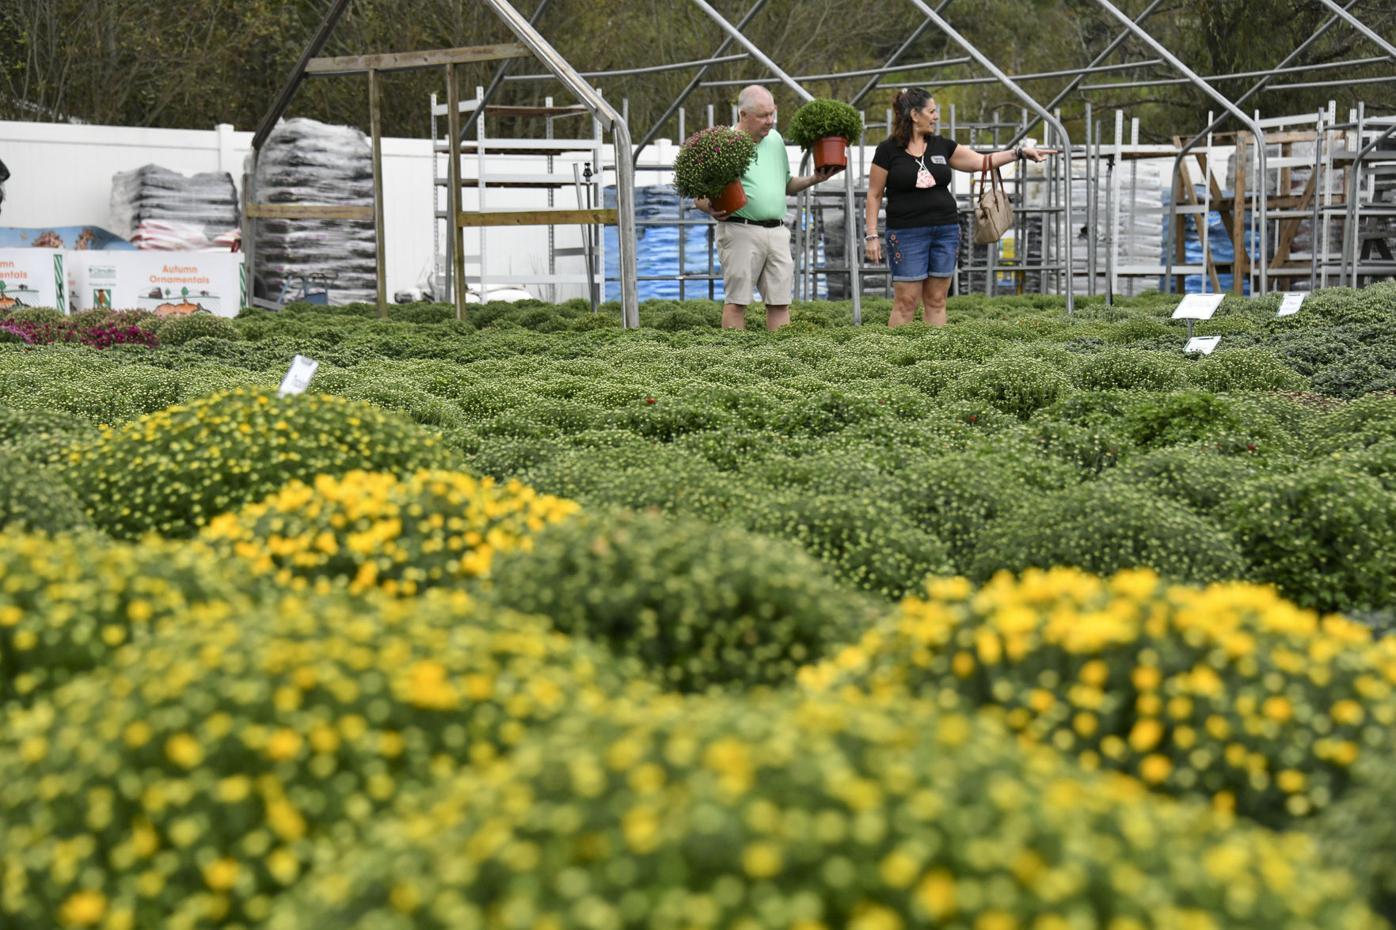 Fall favorites: Garden centers move mums, peddle pumpkins